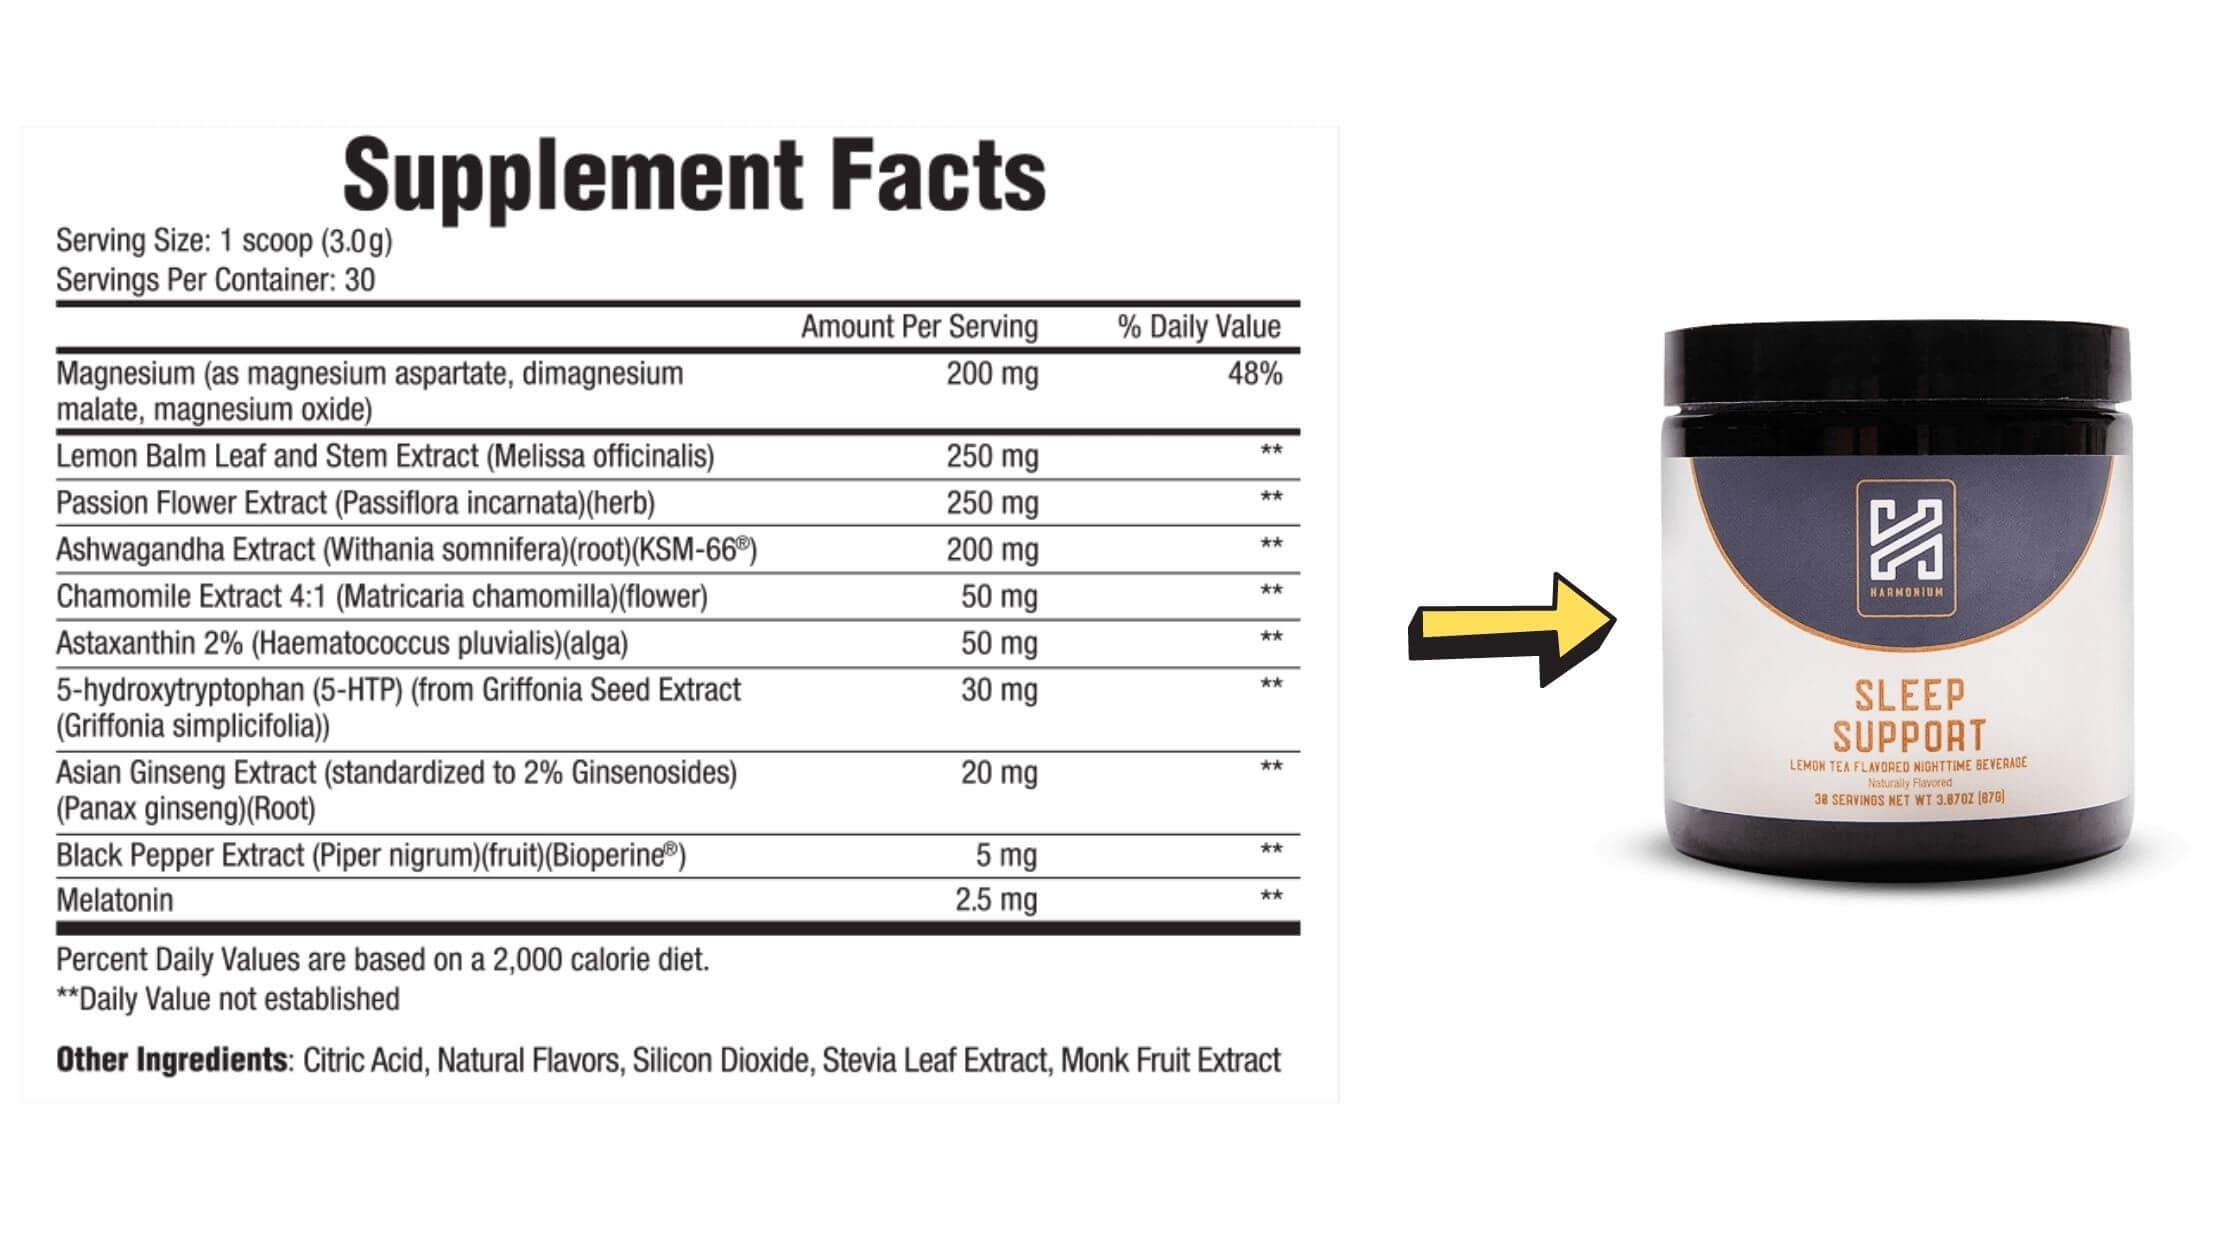 Harmonium Sleep Support Supplement Facts & Dosage